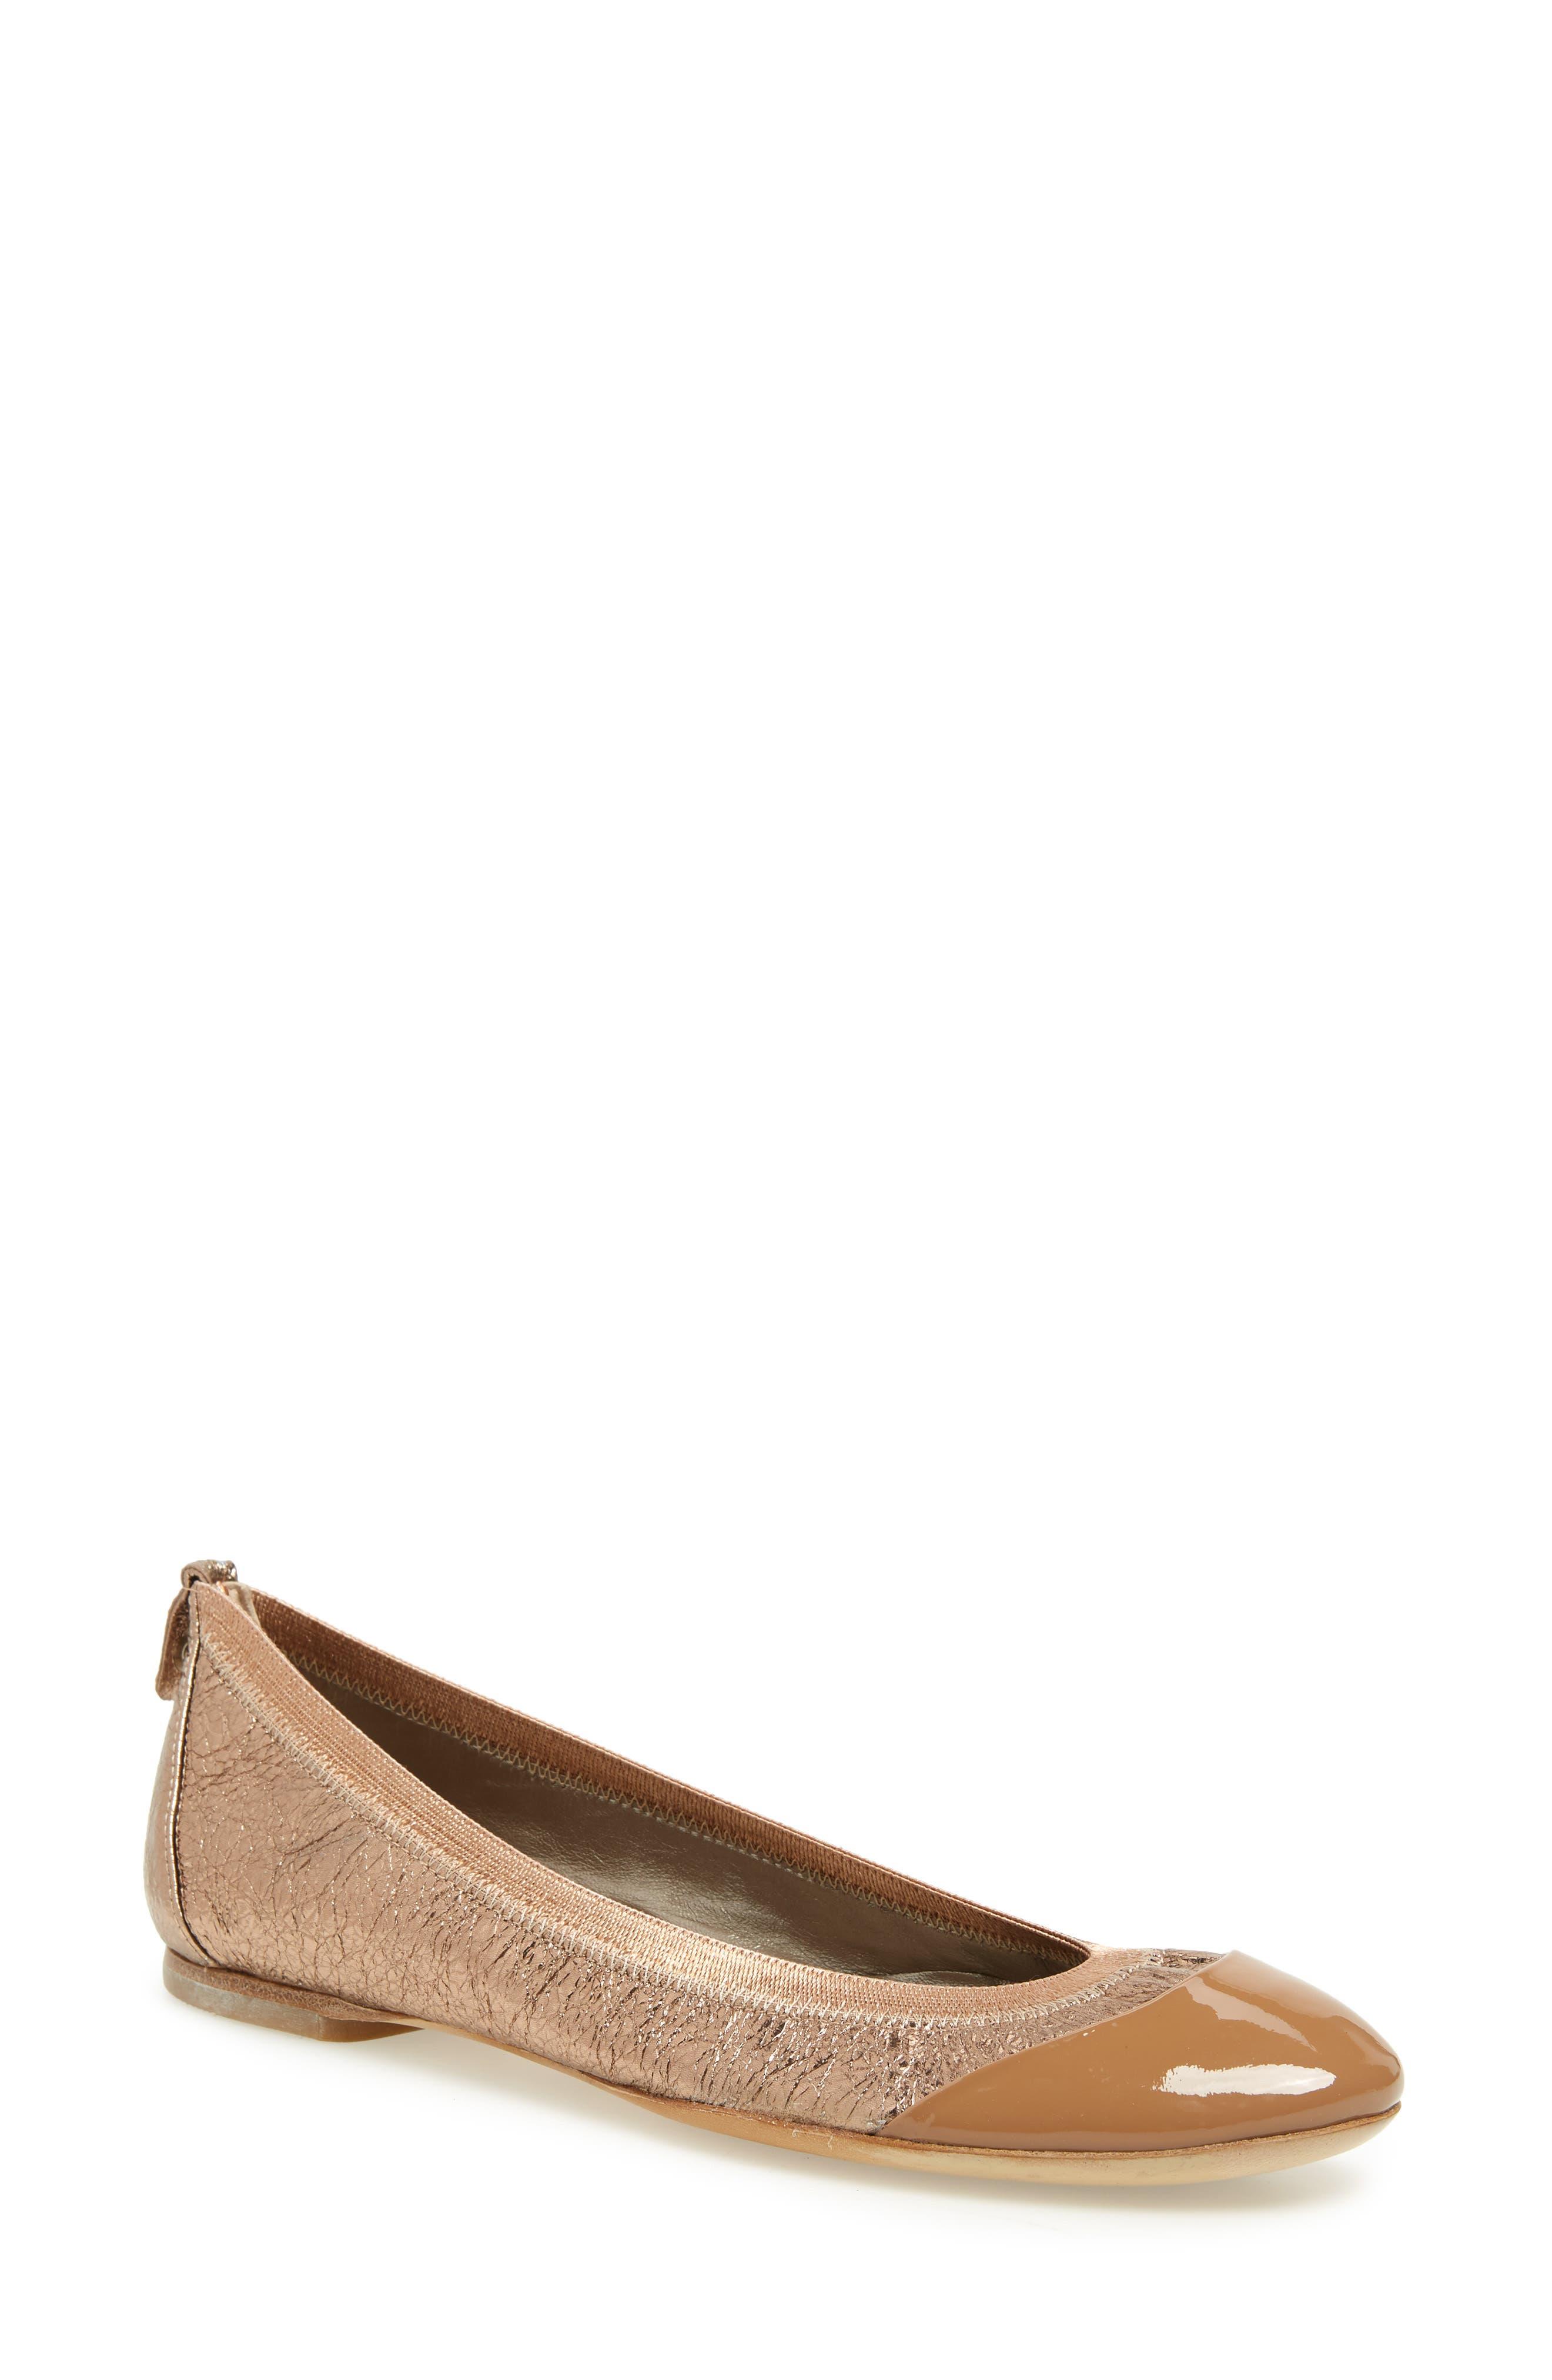 AGL ATTILIO GIUSTI LEOMBRUNI Elasticized Topline Ballet Flat in Copper Crinkle